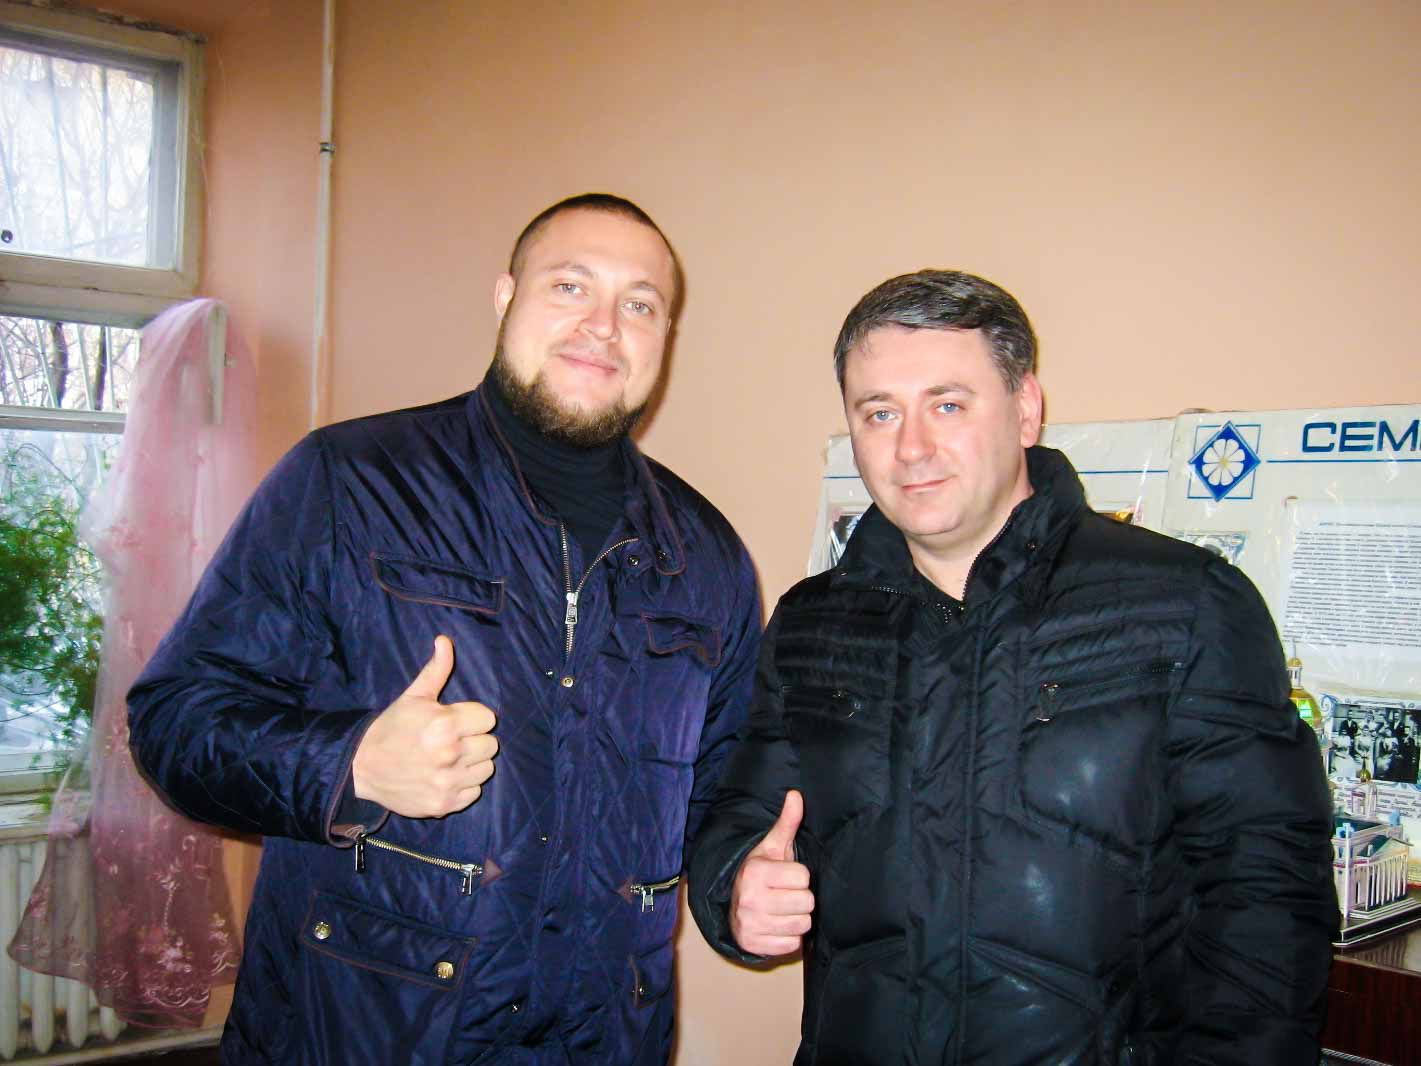 Сажко Андрей и Черненко Тарас - активисты проекта